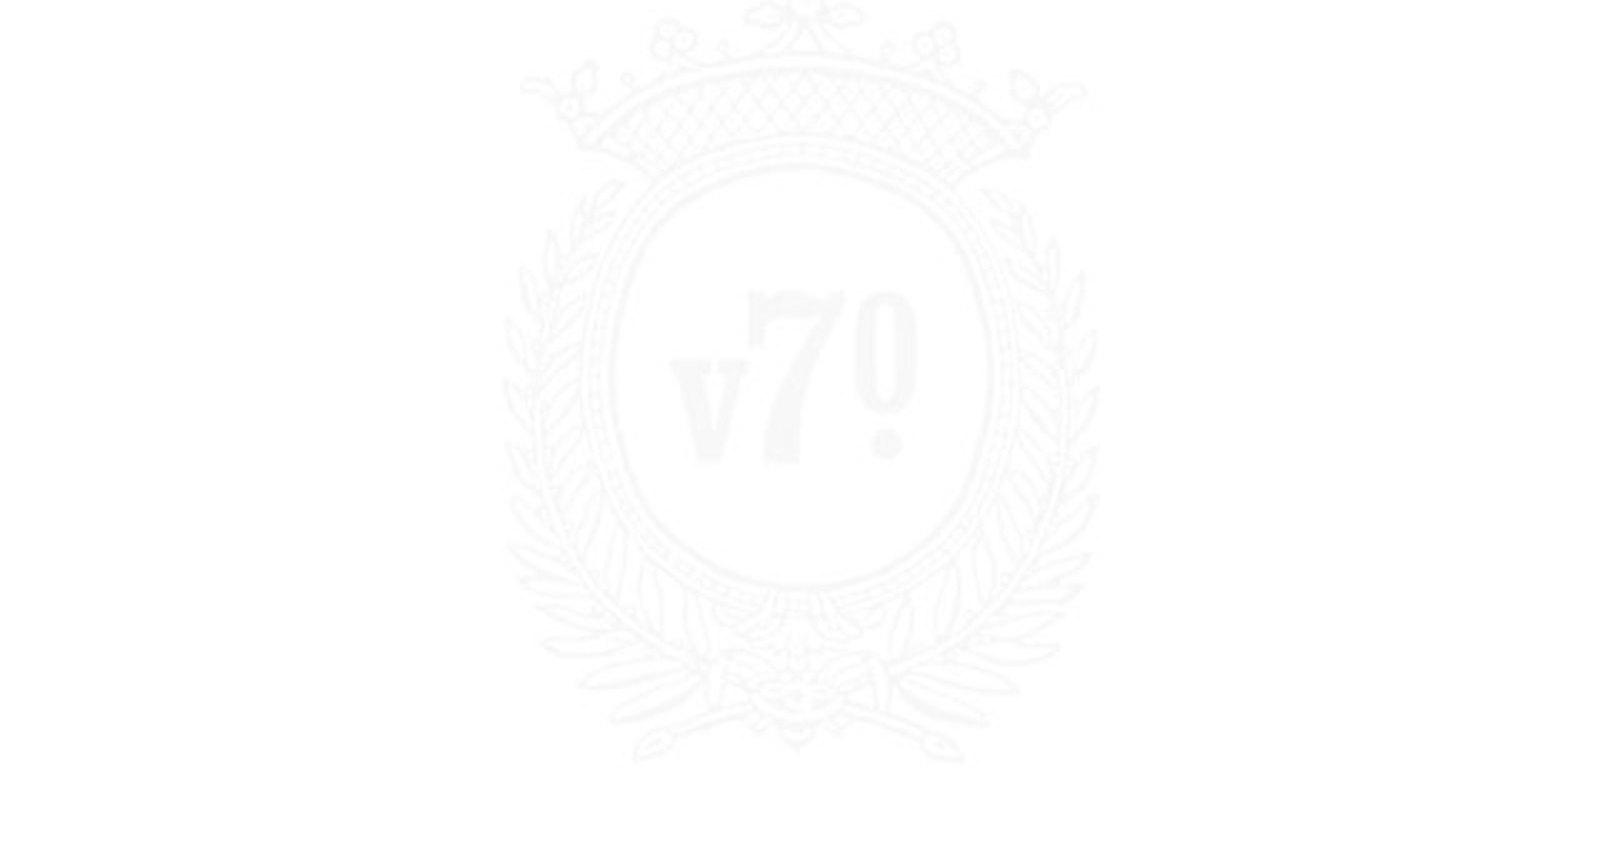 space150 v 7.0 complete identity program